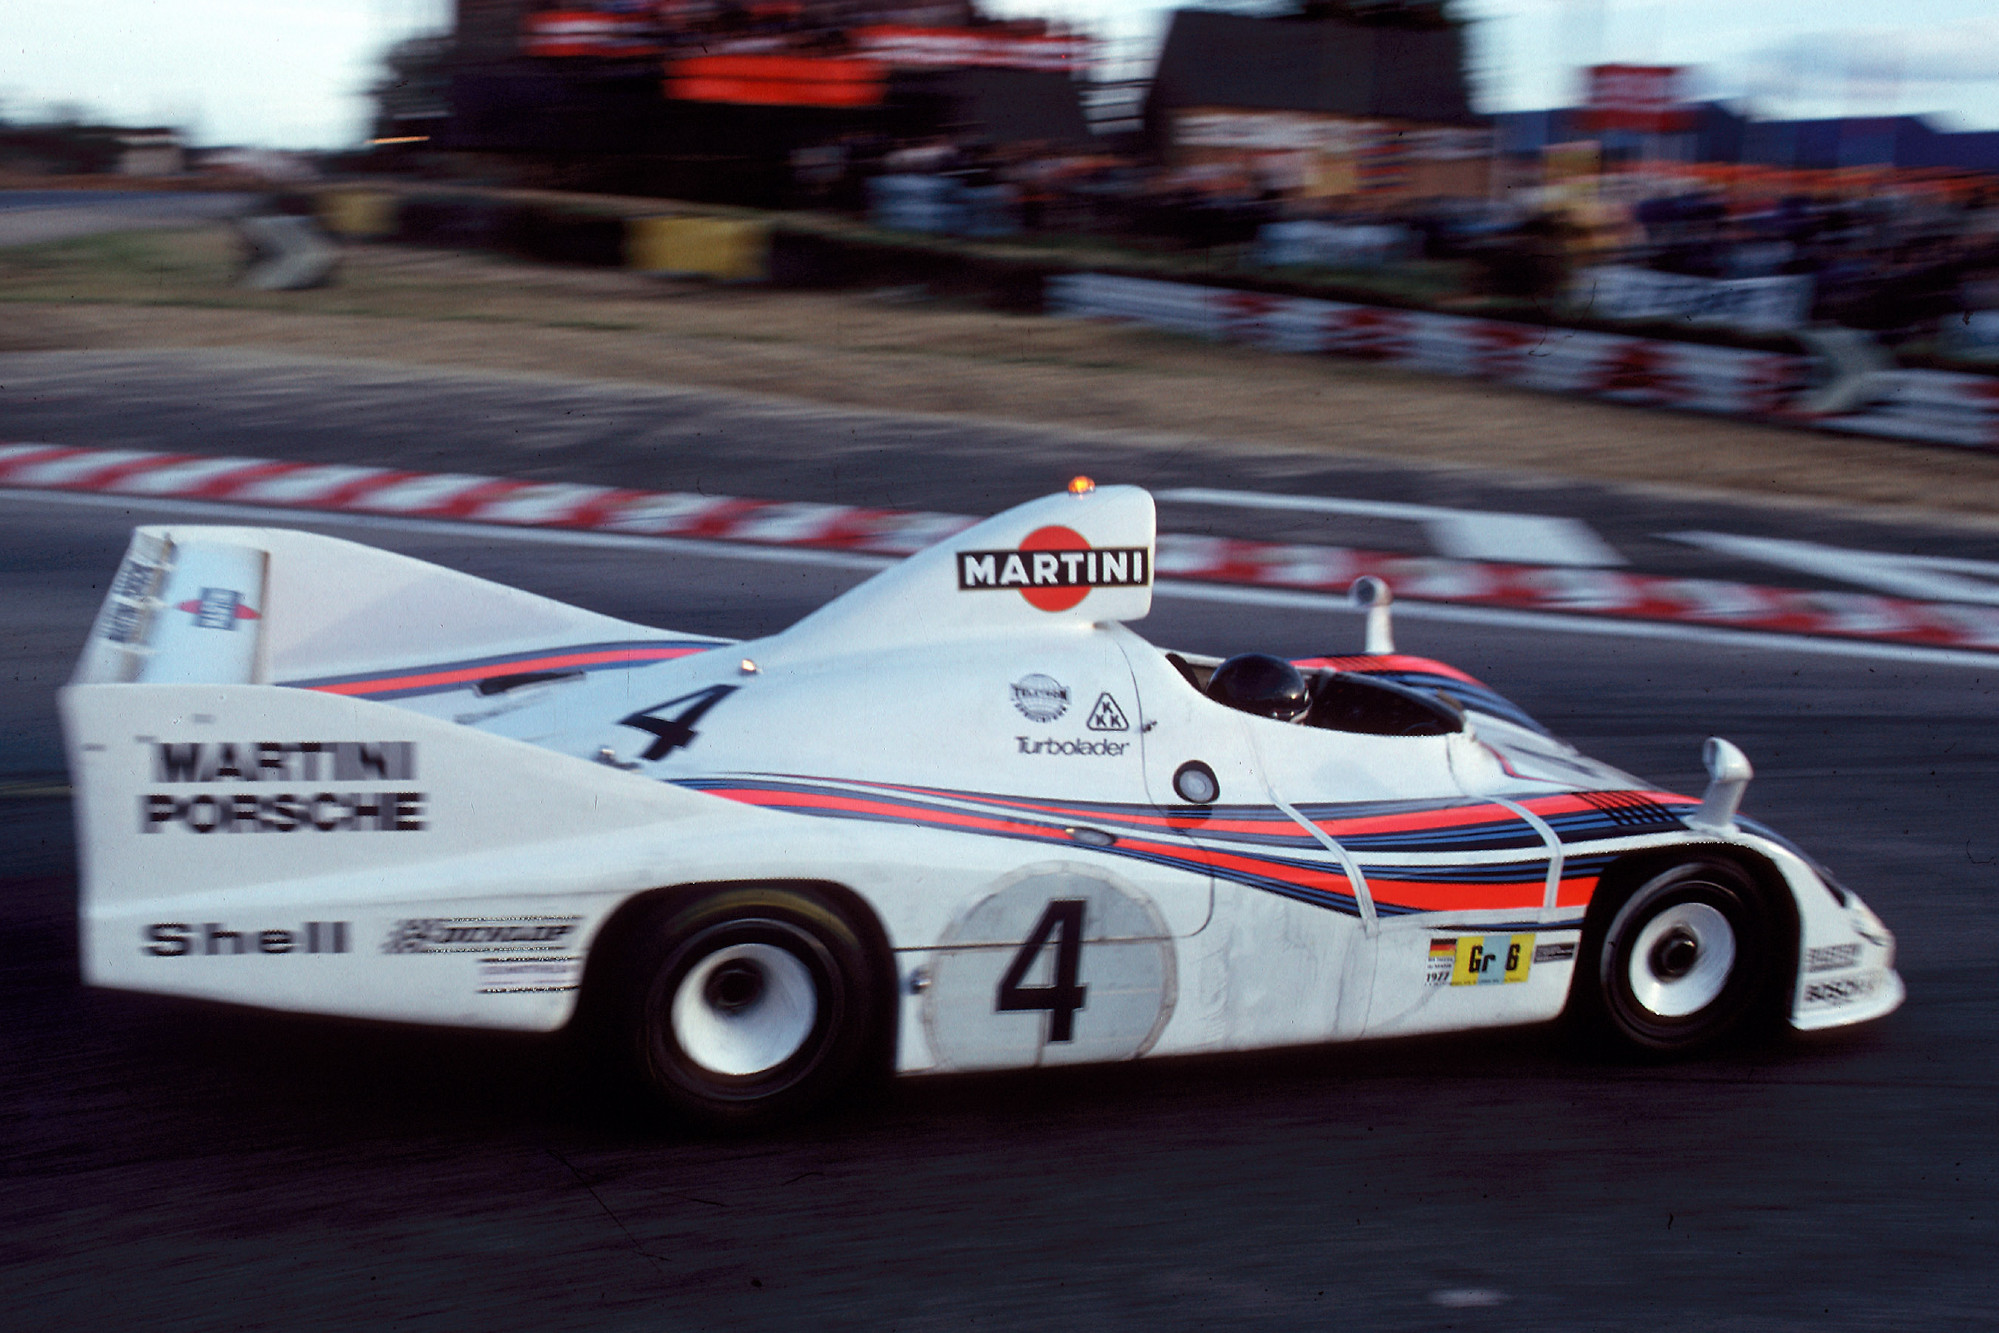 Porsche 936, 1977 Le Mans